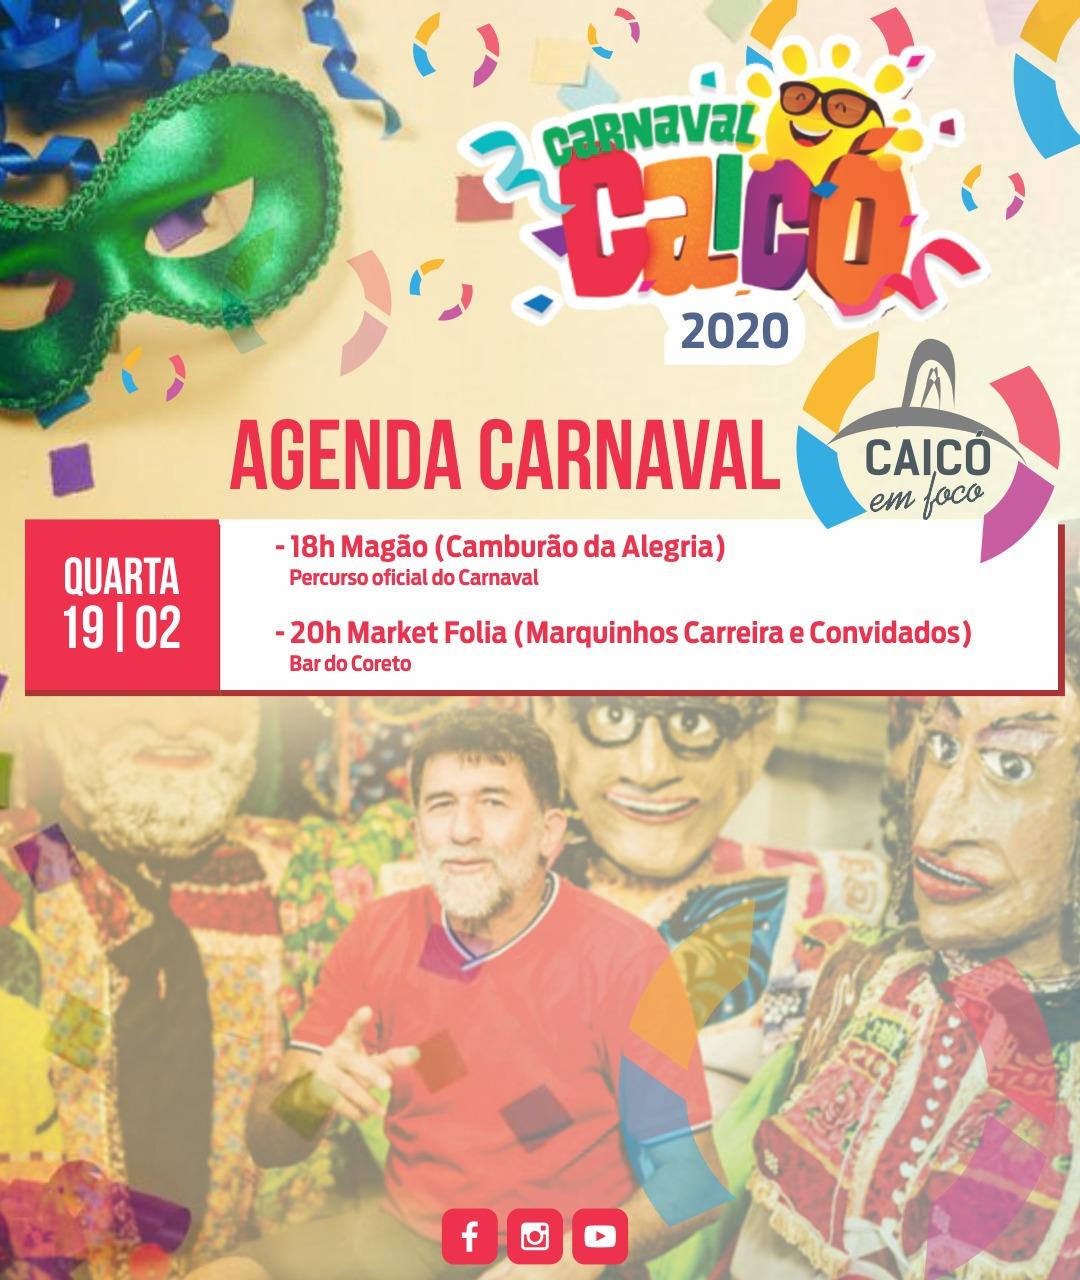 Agenda do carnaval 2020